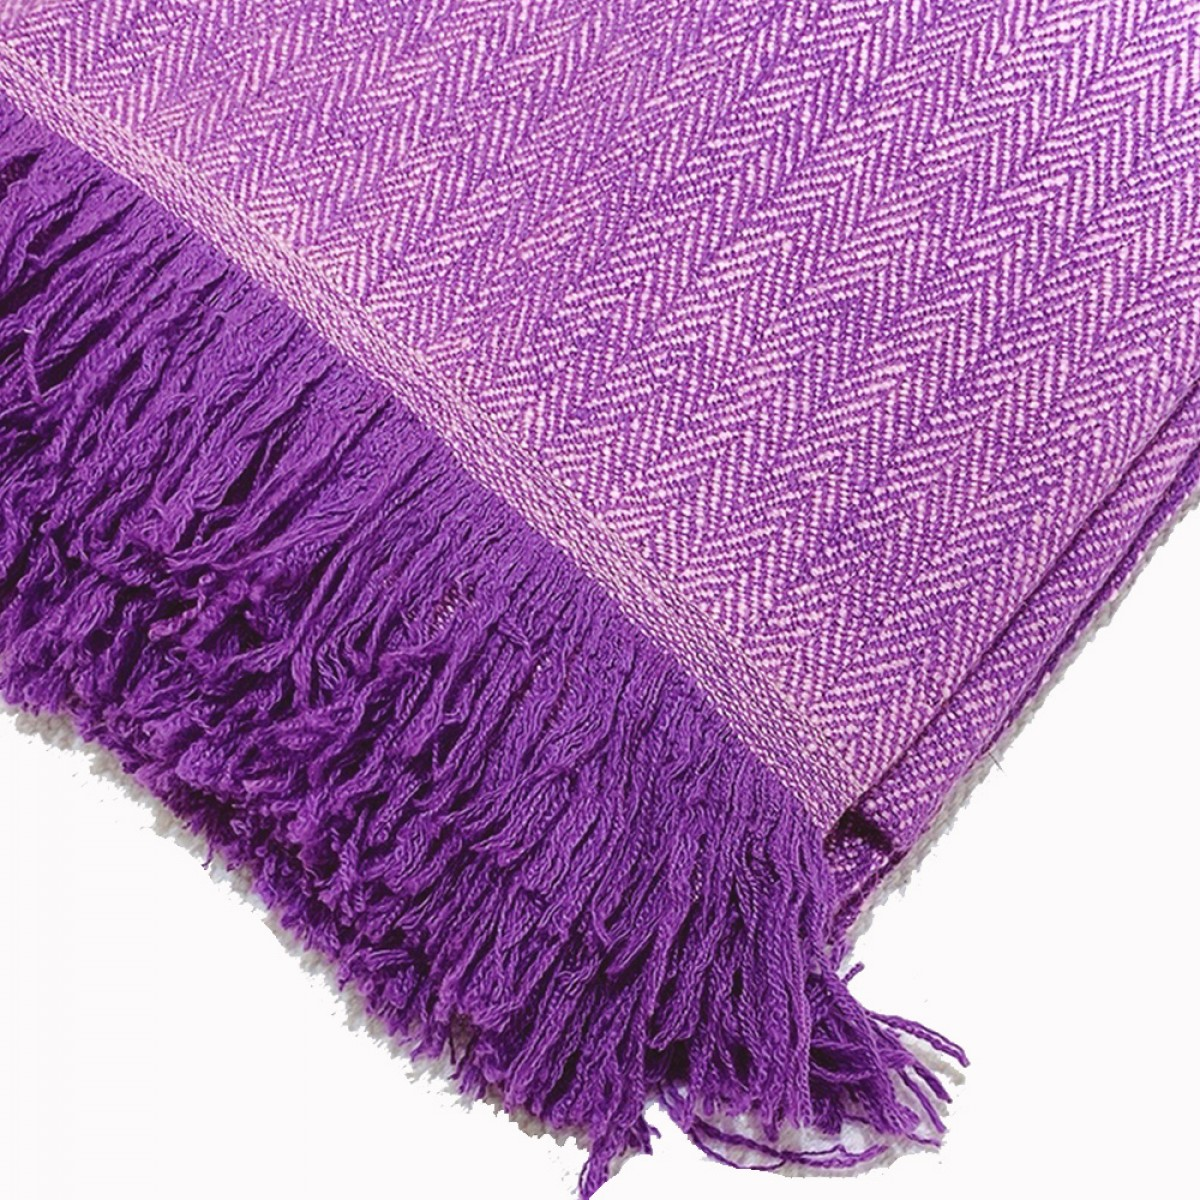 Purple Herringbone Weave Cashmere Blanket